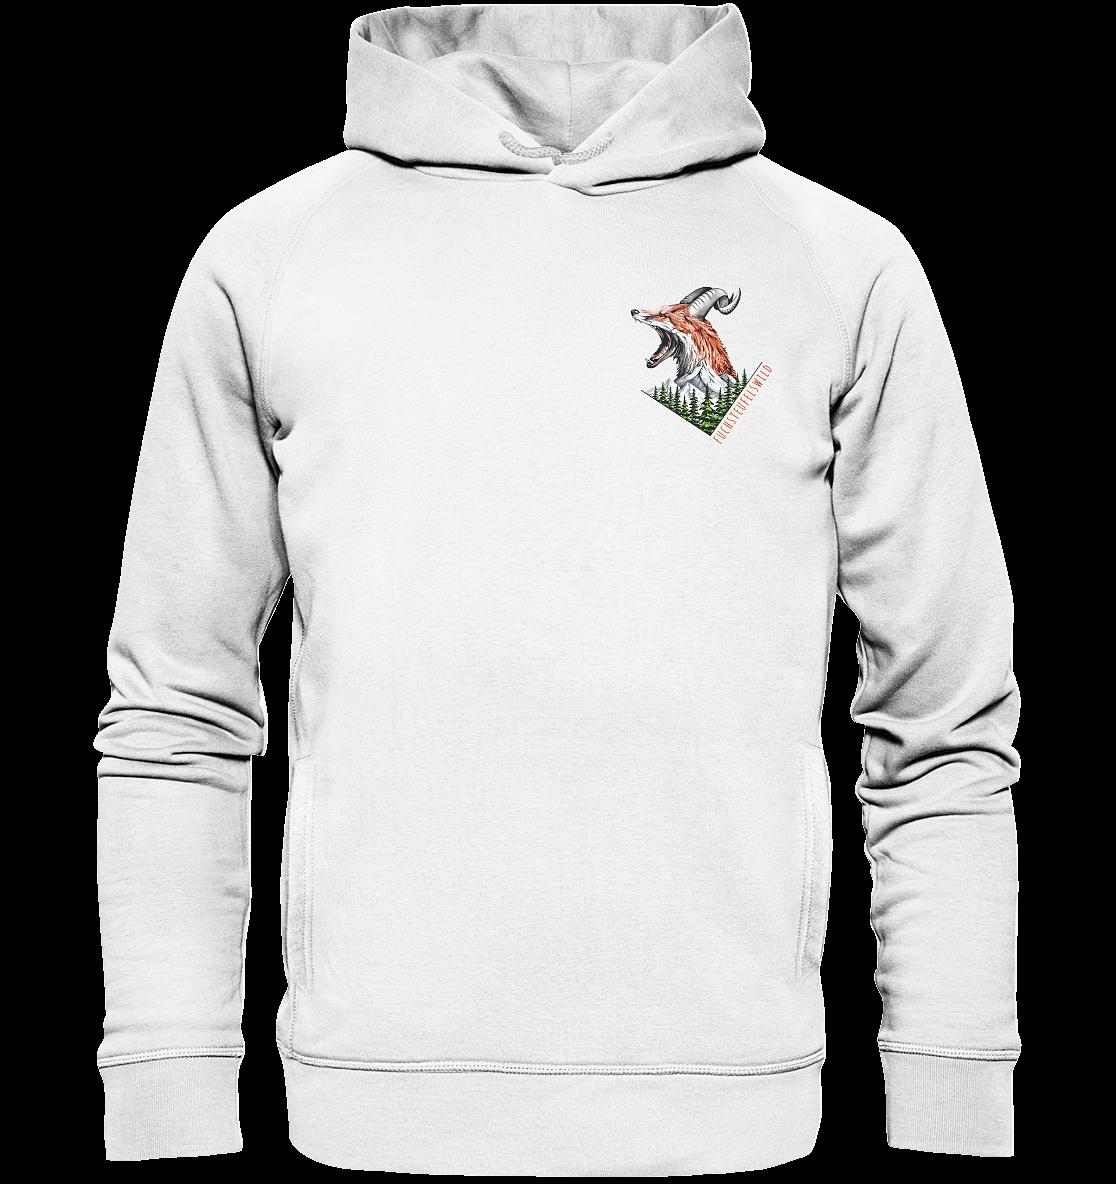 front-organic-fashion-hoodie-f8f8f8-1116x-1.png